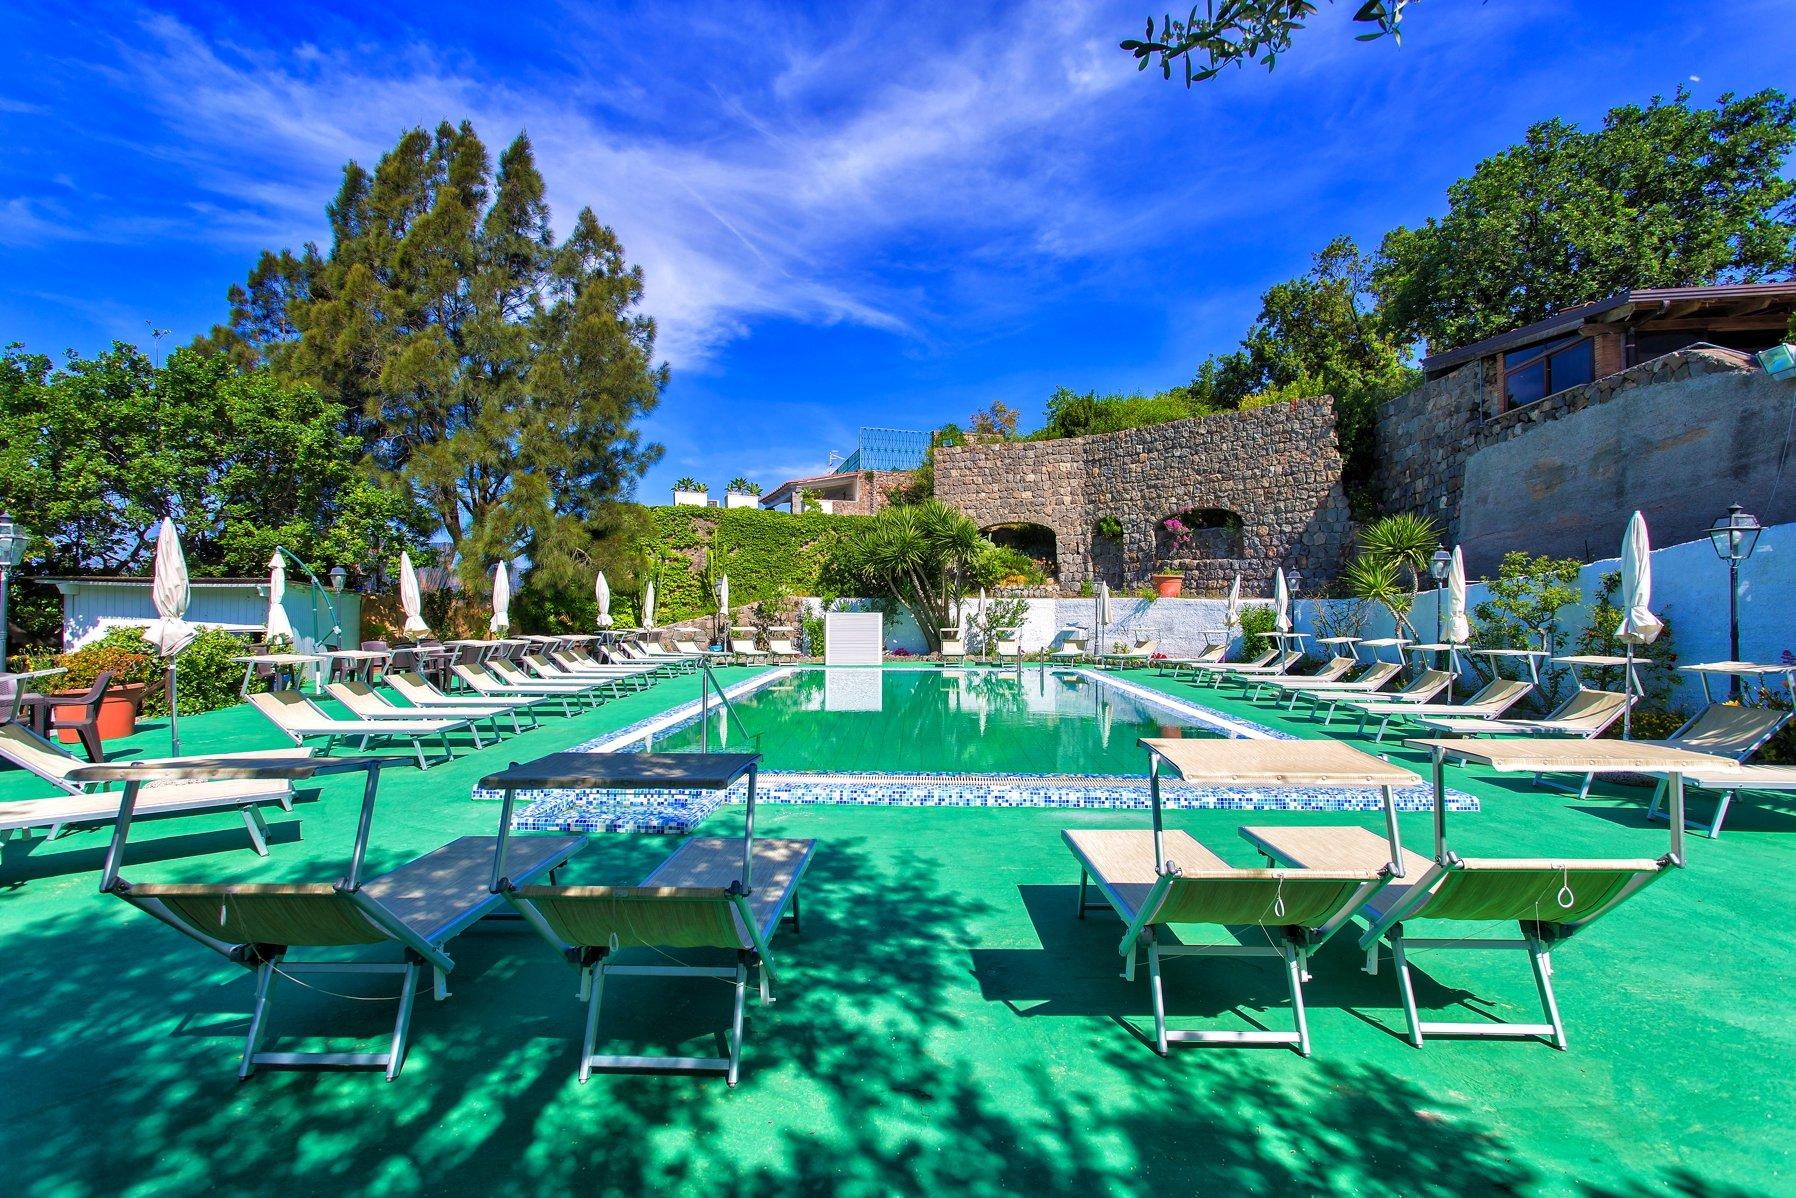 Hotel Parco dei Principi Ischia, Albergo Hotel Parco dei Principi Ischia